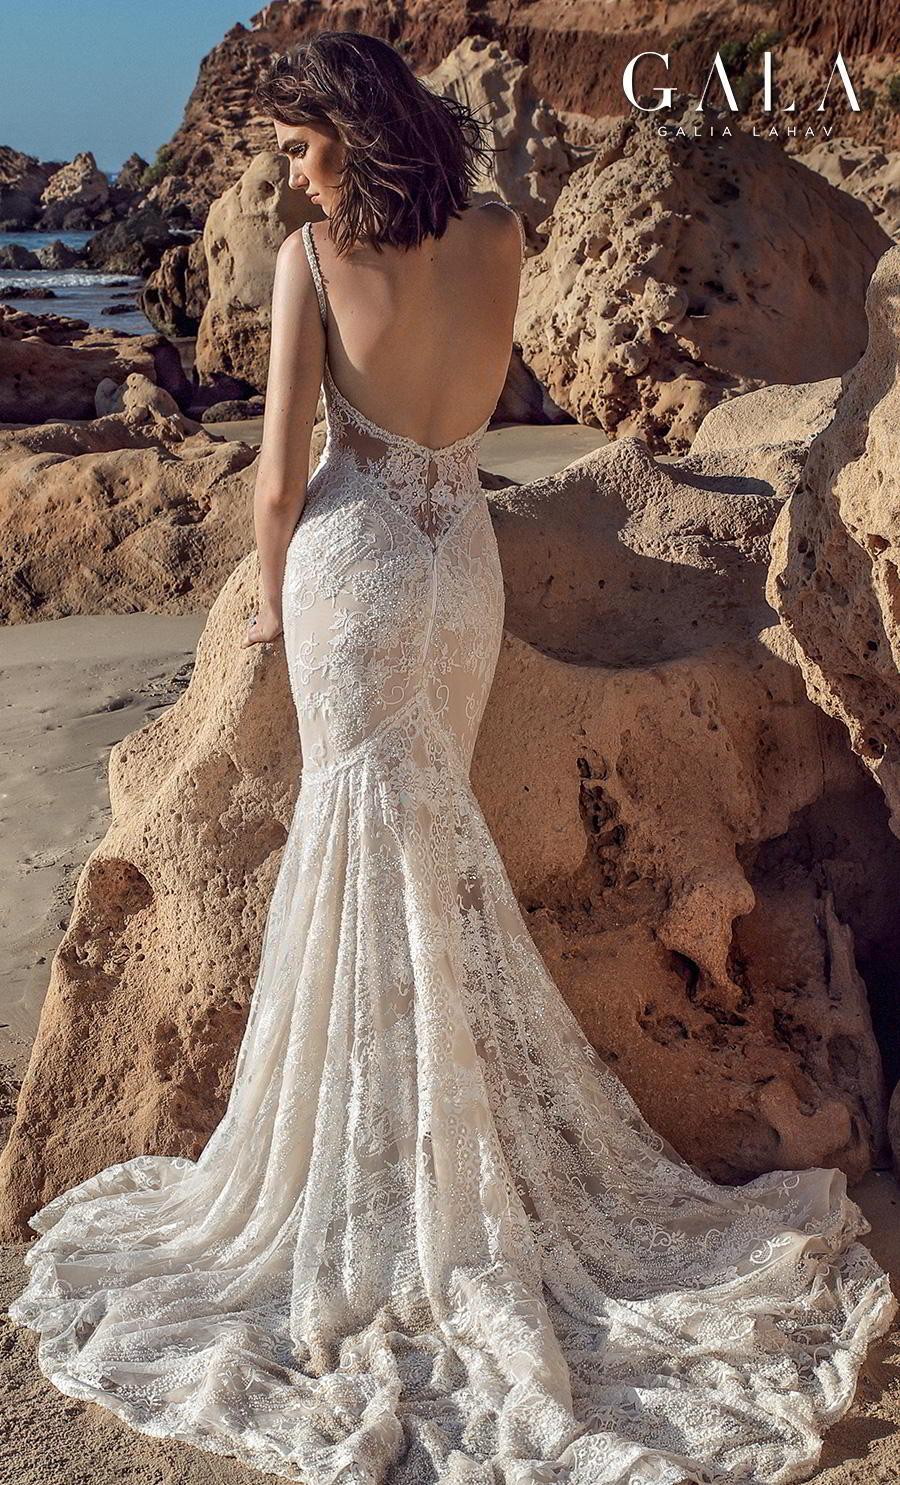 galia lahav fall 2020 gala no 9 bridal sleeveless thin strap deep plunging v neck full embellishment elegant fit and flare mermaid wedding dress backless medium train (404) bv